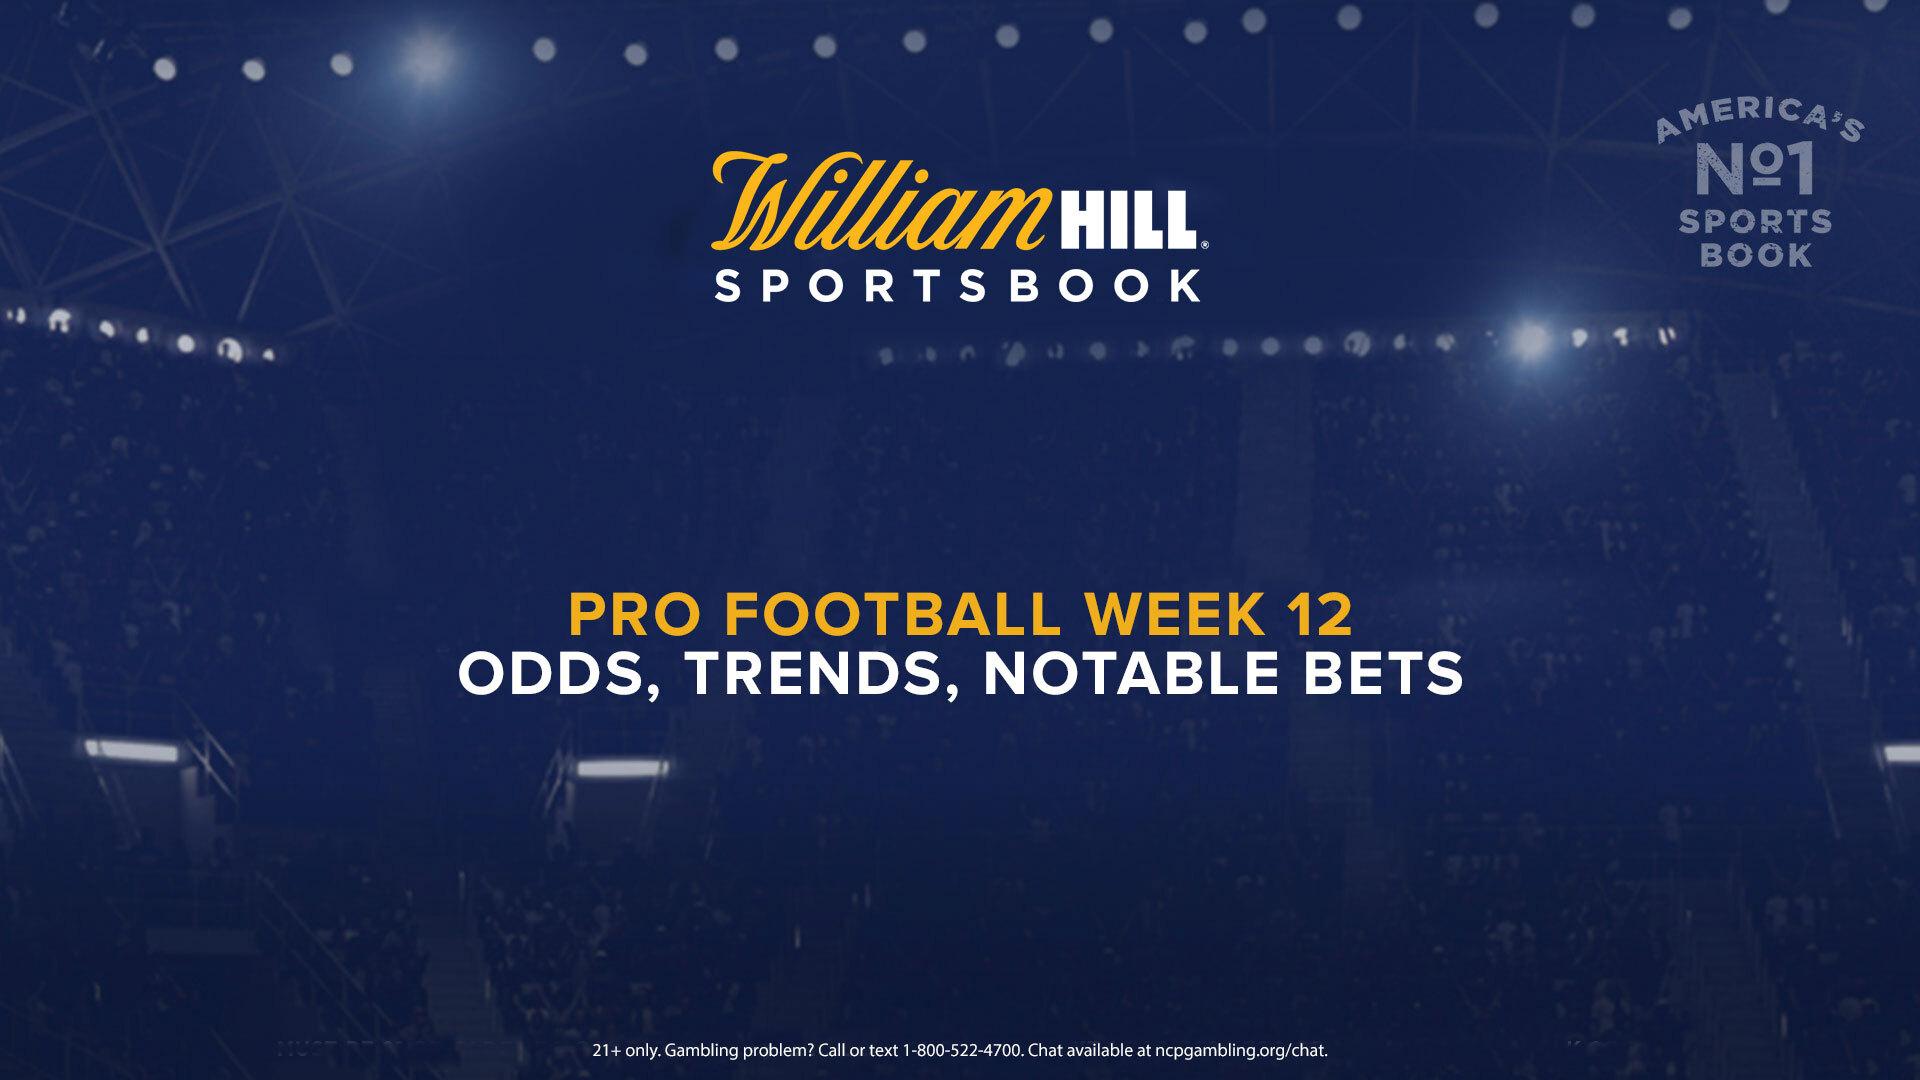 Betting trends nfl week 12 odds sky bet sports pariuri sportive online